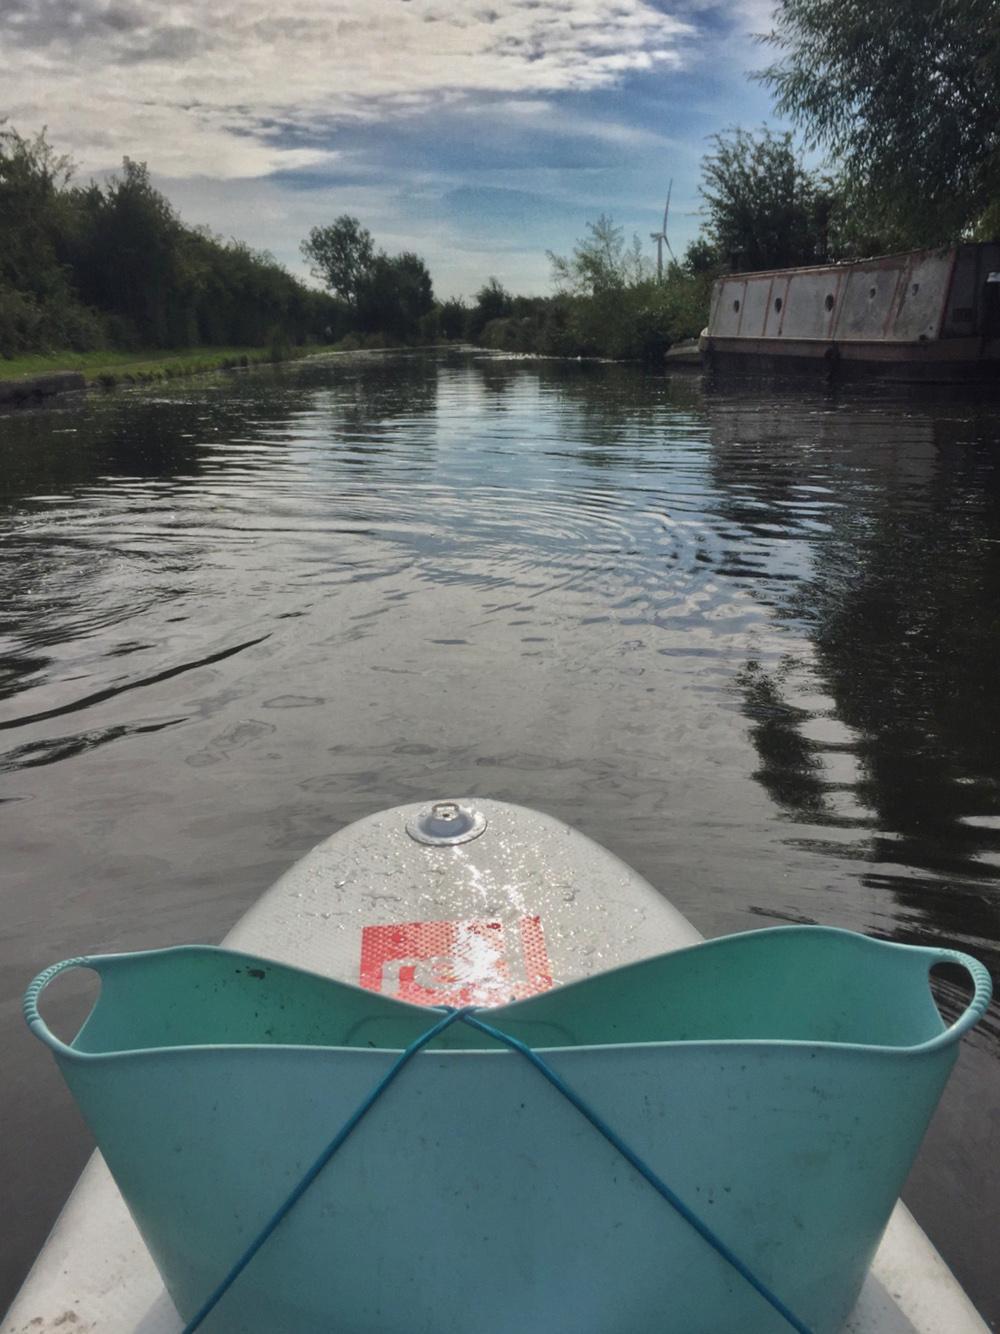 Splodz Blogz | Plastic Patrol SUP litter pick in Nottingham